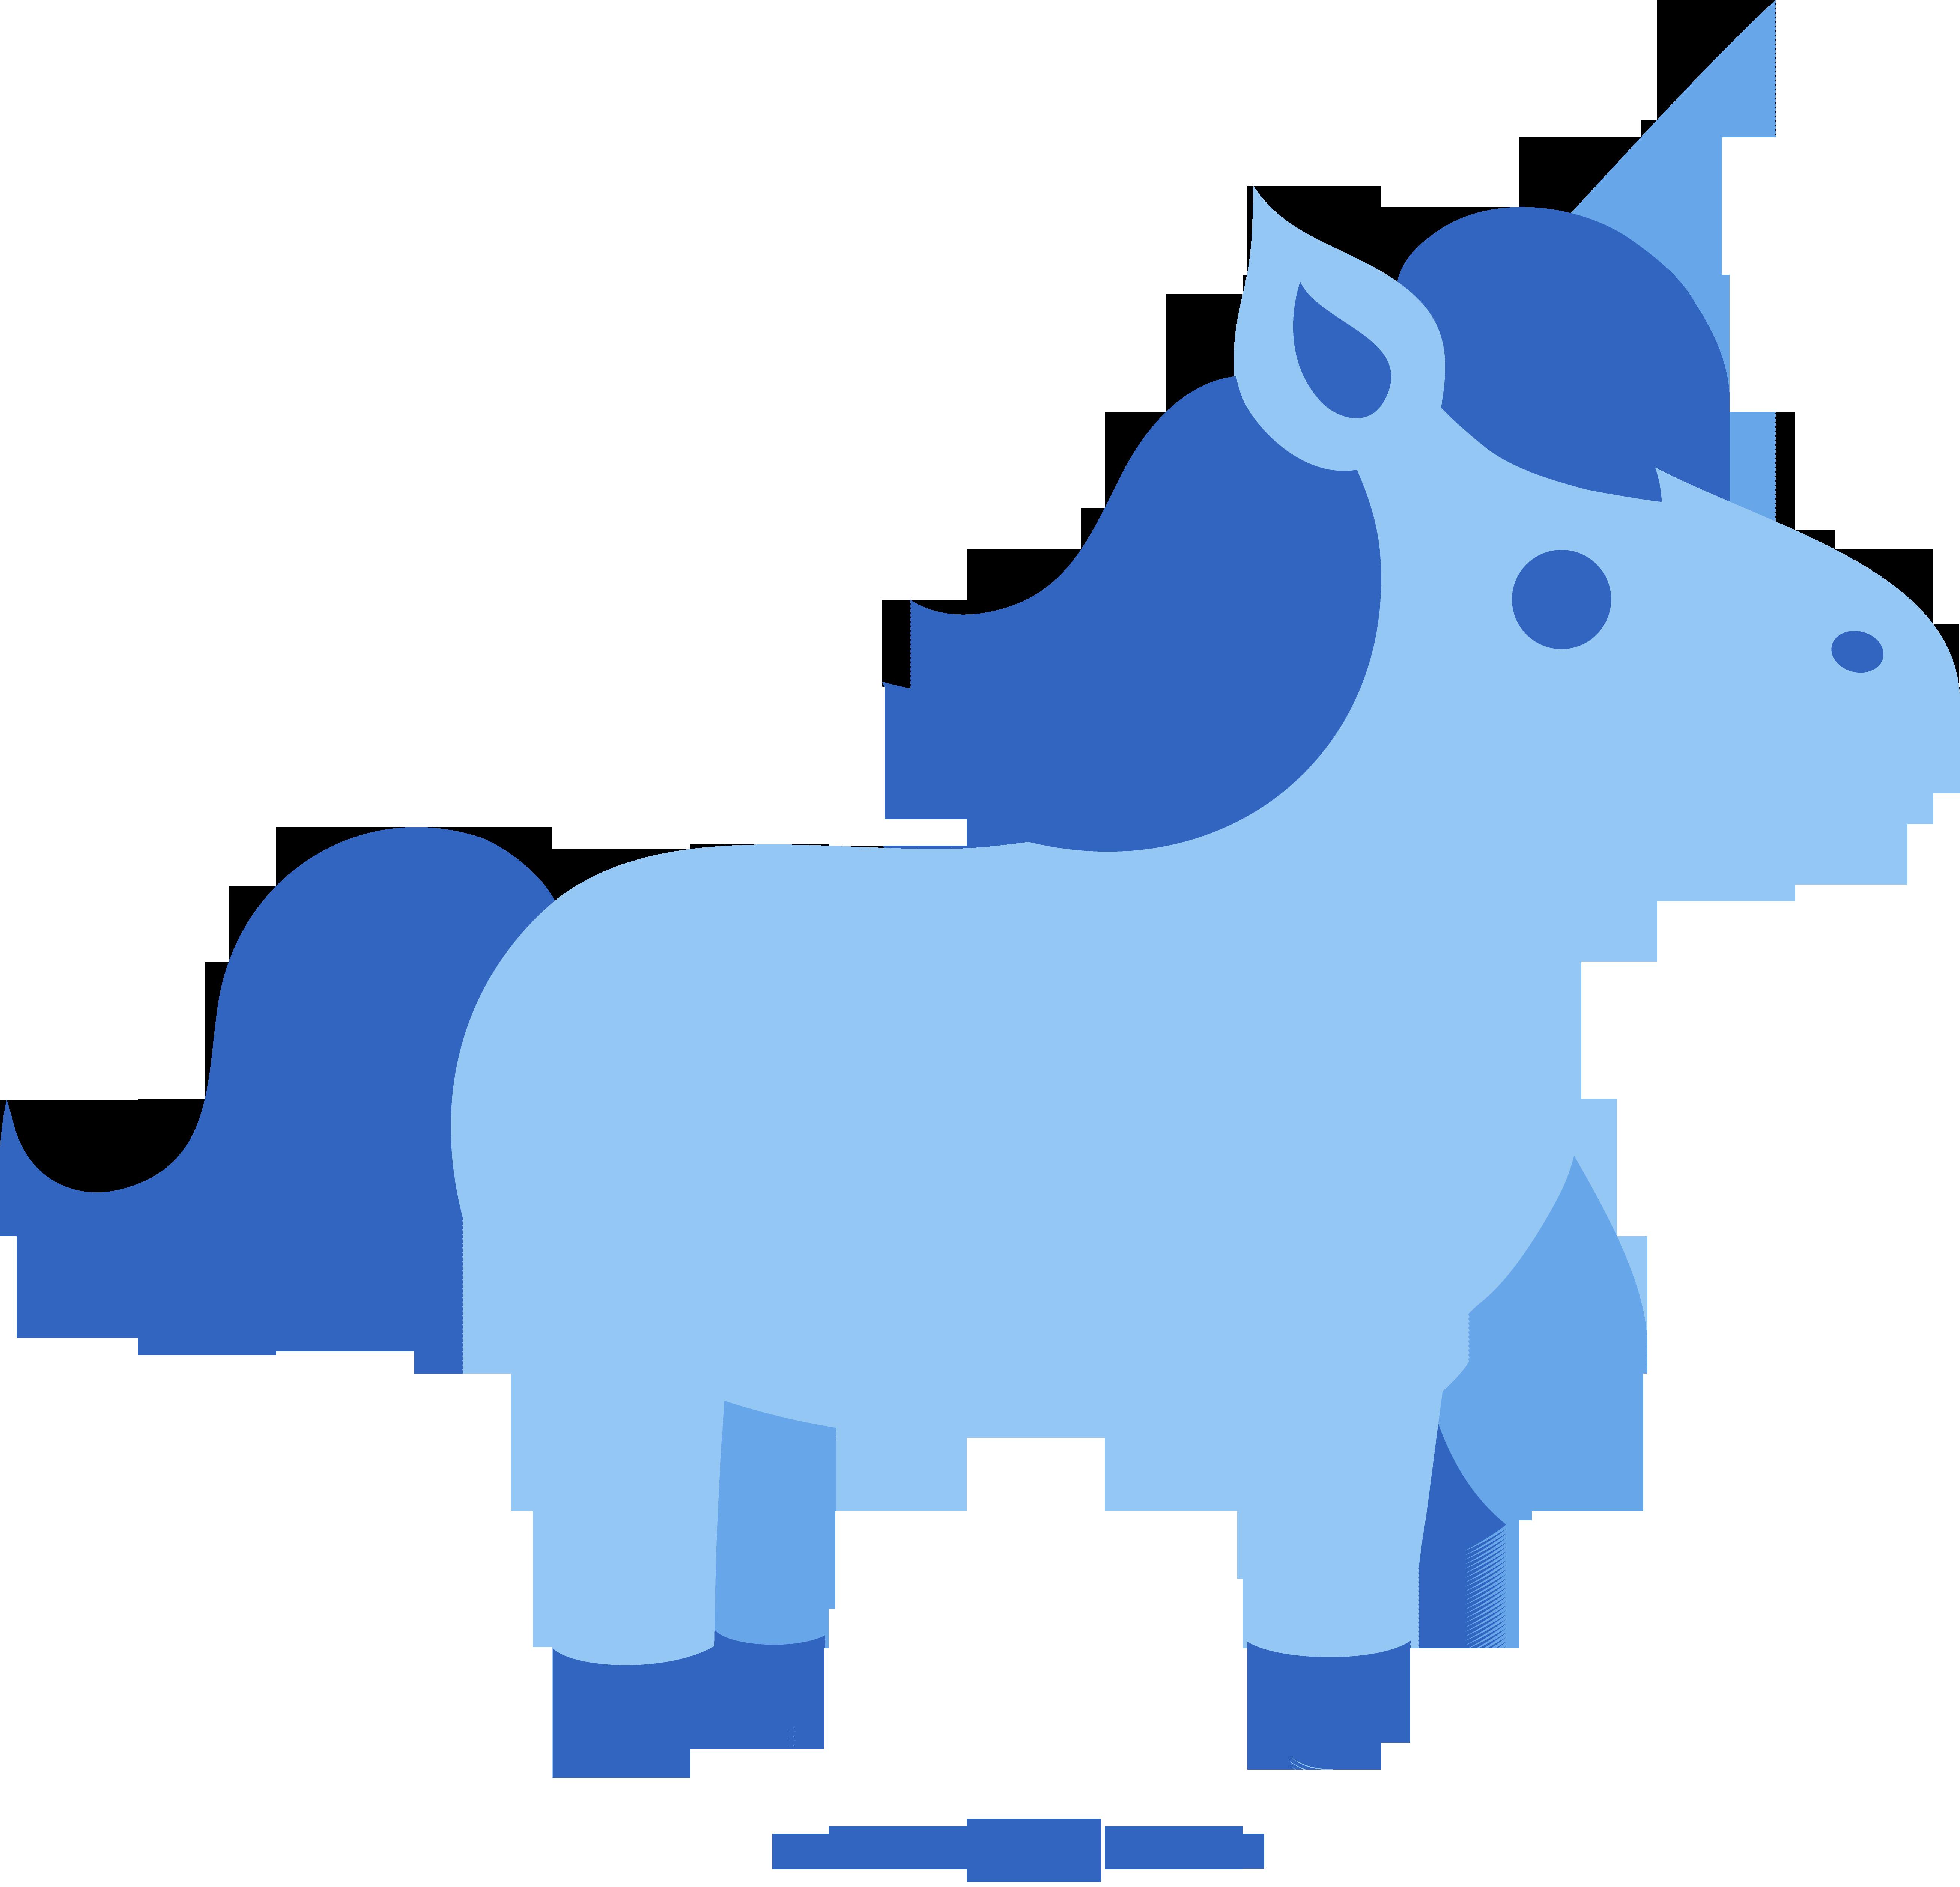 5223x5028 Delightful Free Unicorn Clipart 7 Paper Craft